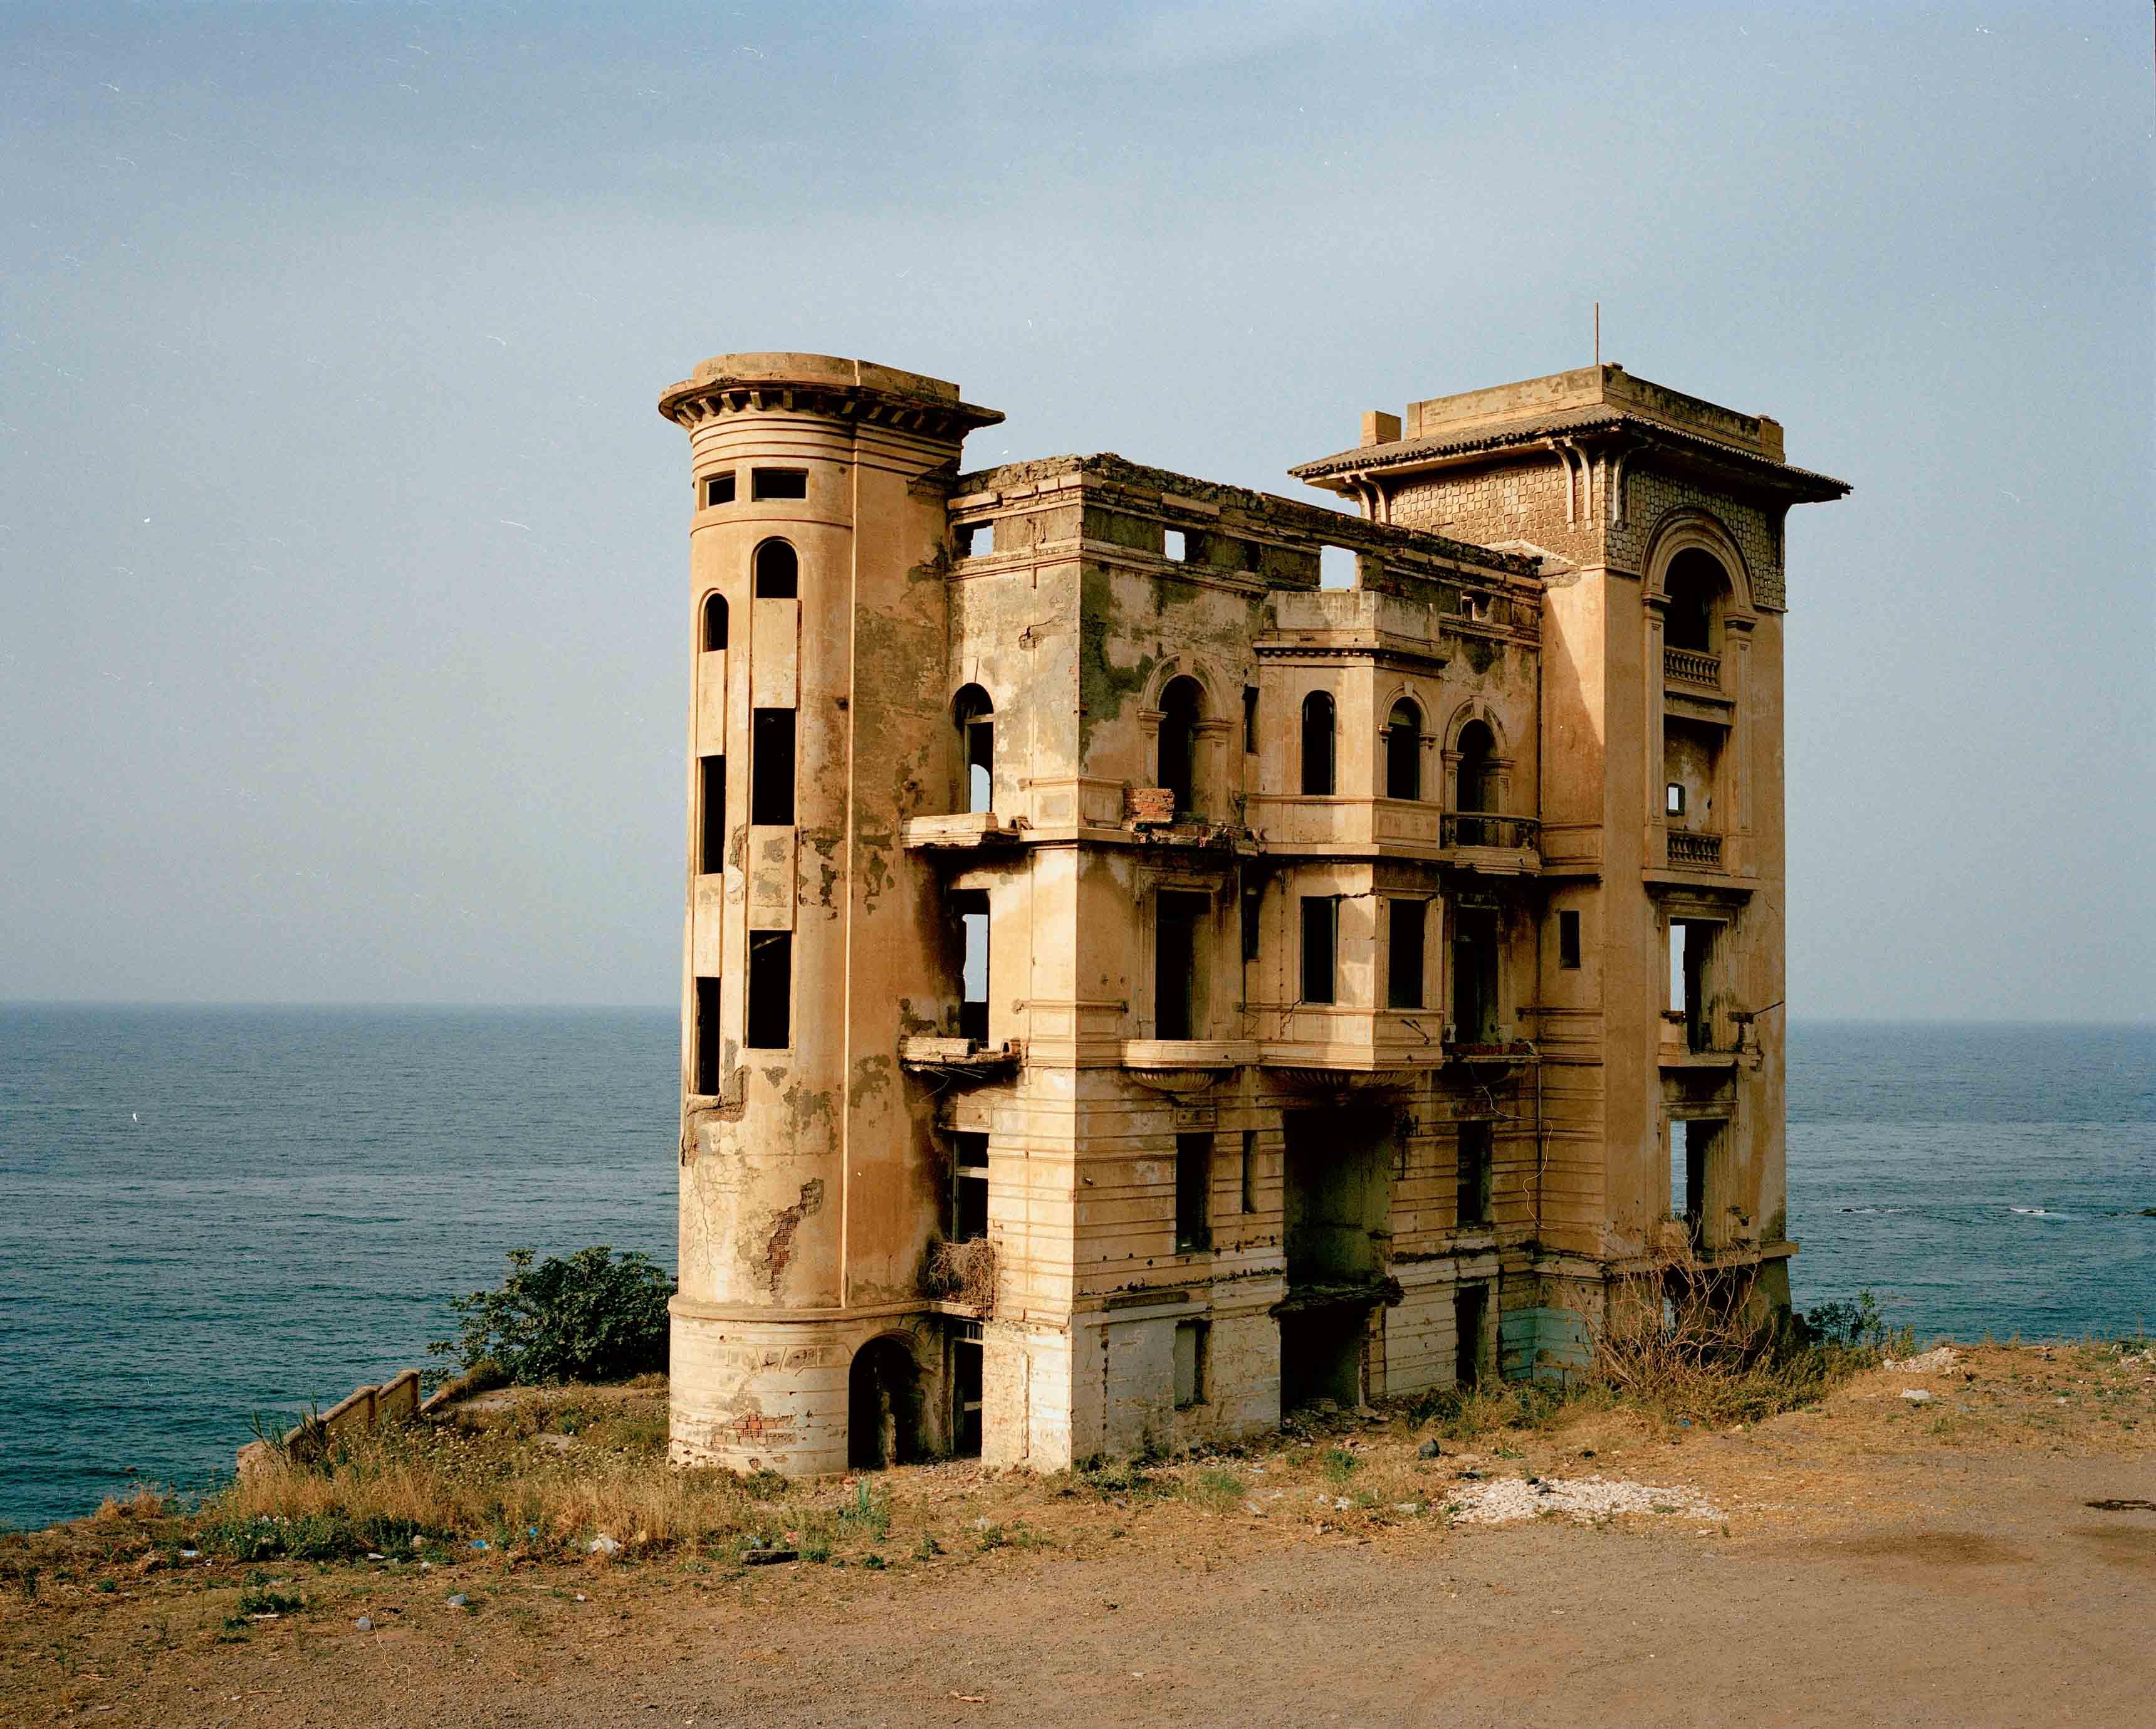 """Haunted House II"" (2006), de Zineb Sedira. Photographie couleur, 80 x 100 cm."